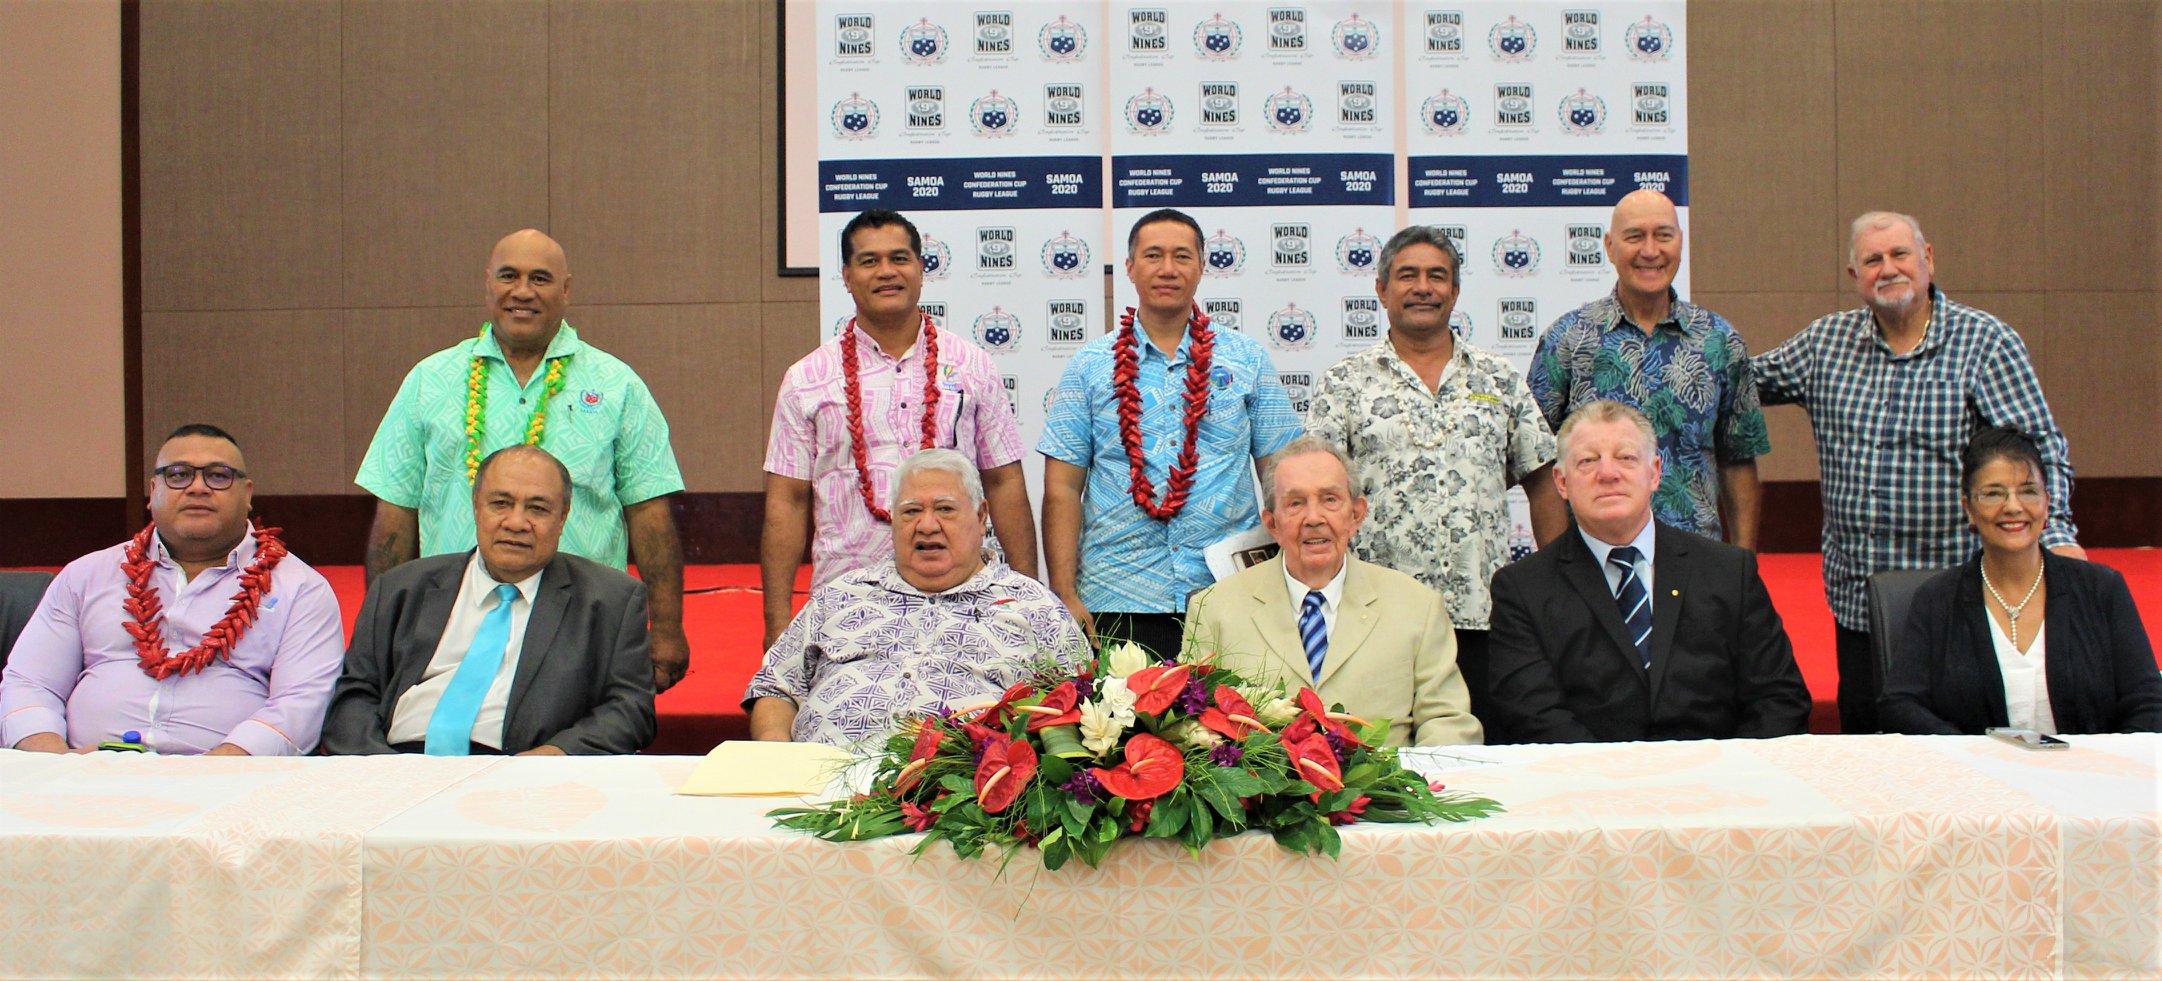 Samoa to host inaugural World Nines Confederation Cup